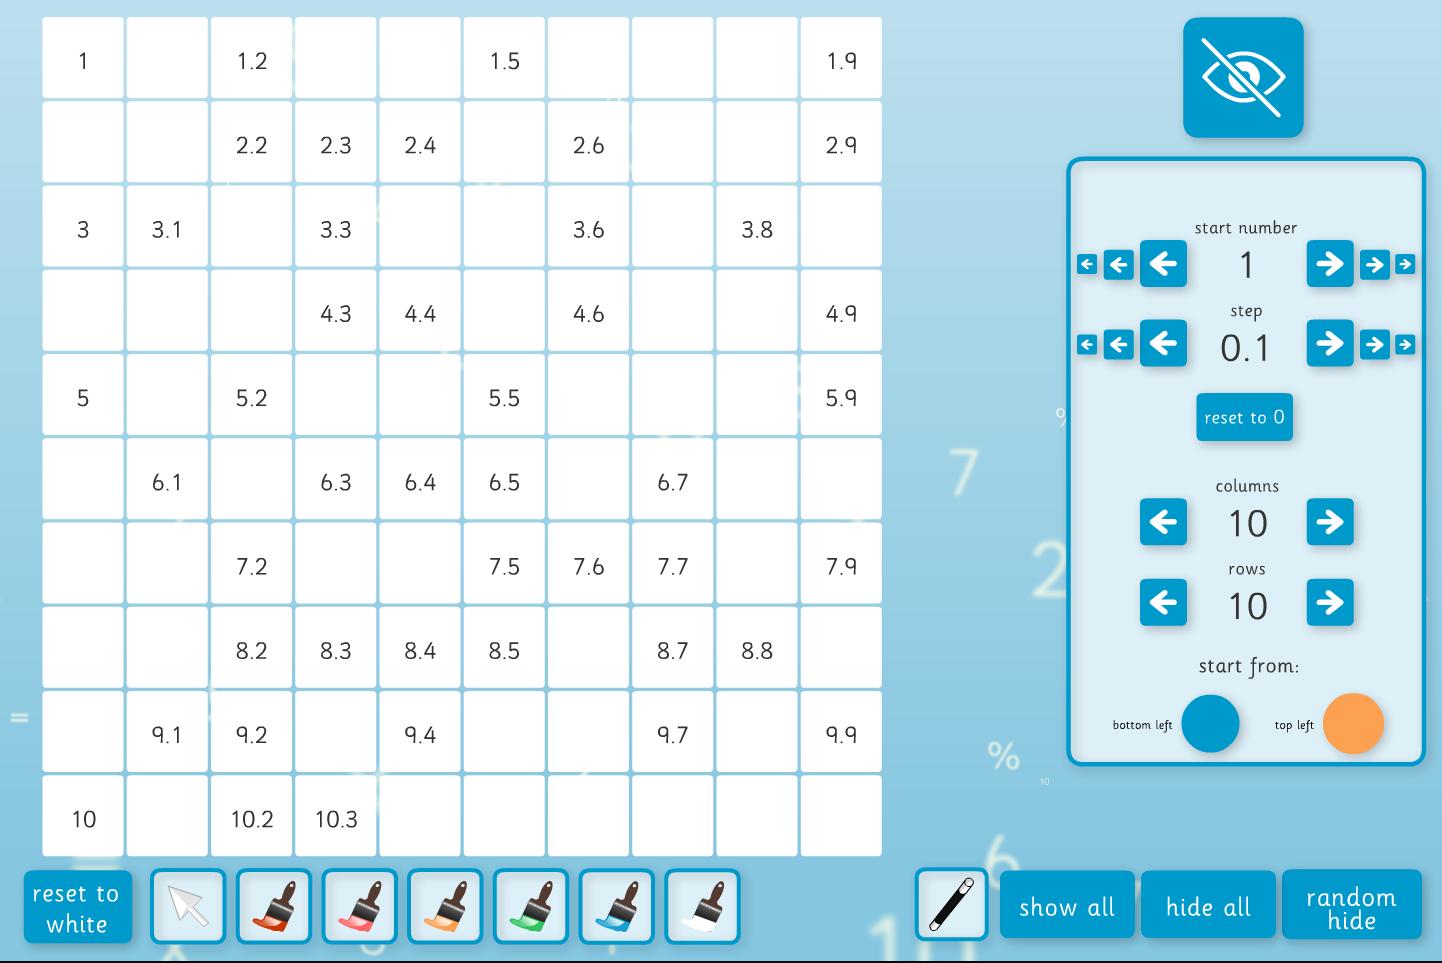 Interactive Number Square Tool (Decimals) - KS2 Number